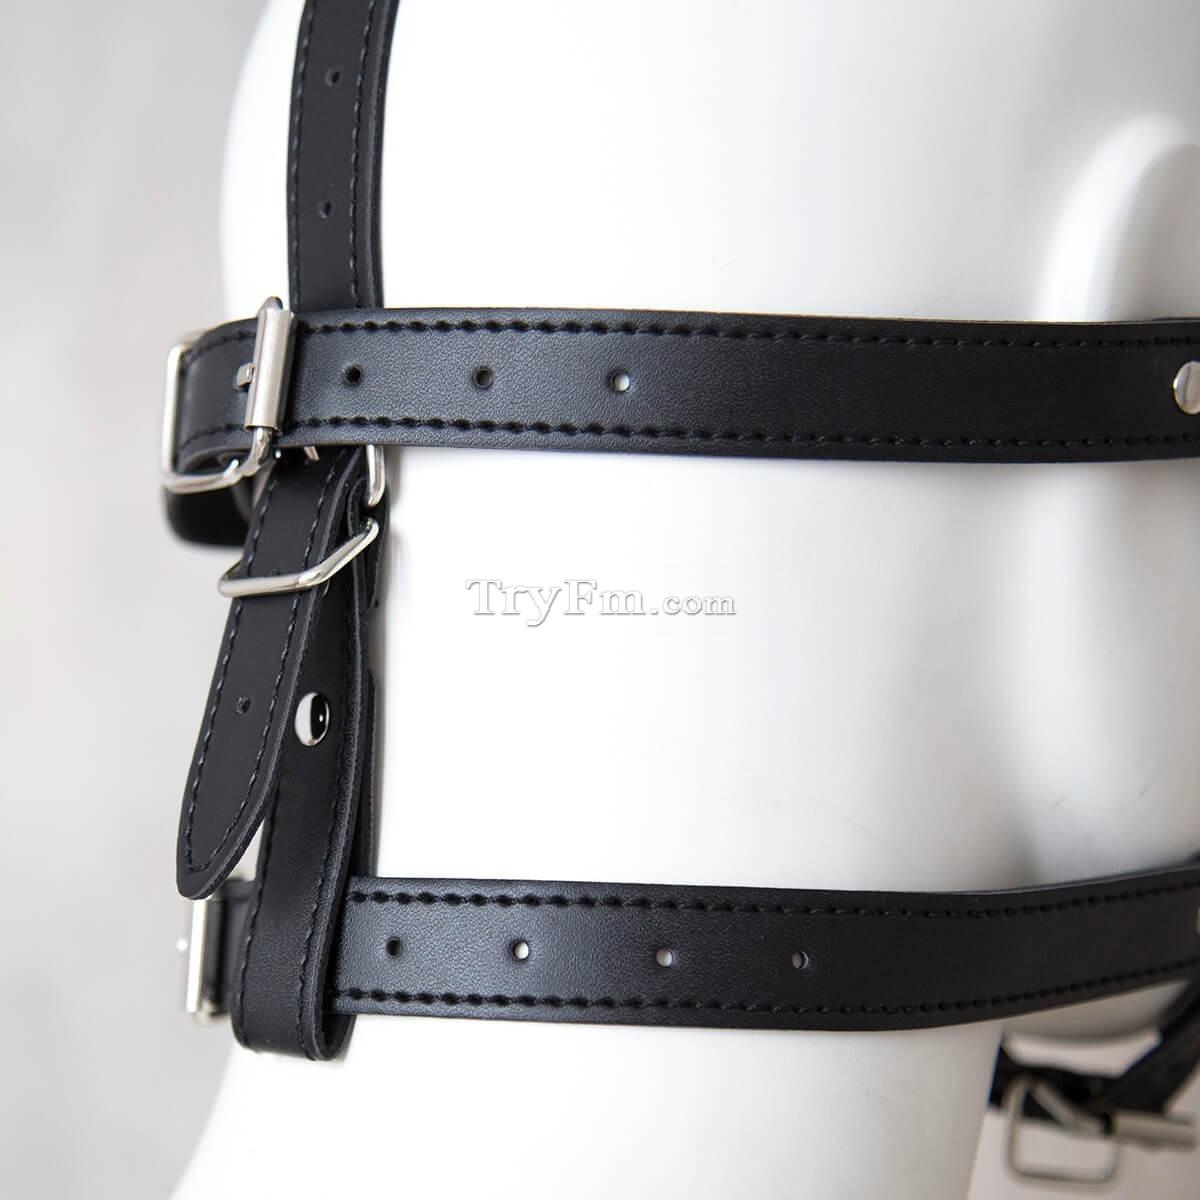 24-Blindfold-Harness-and-Ball-Gag-5.jpg